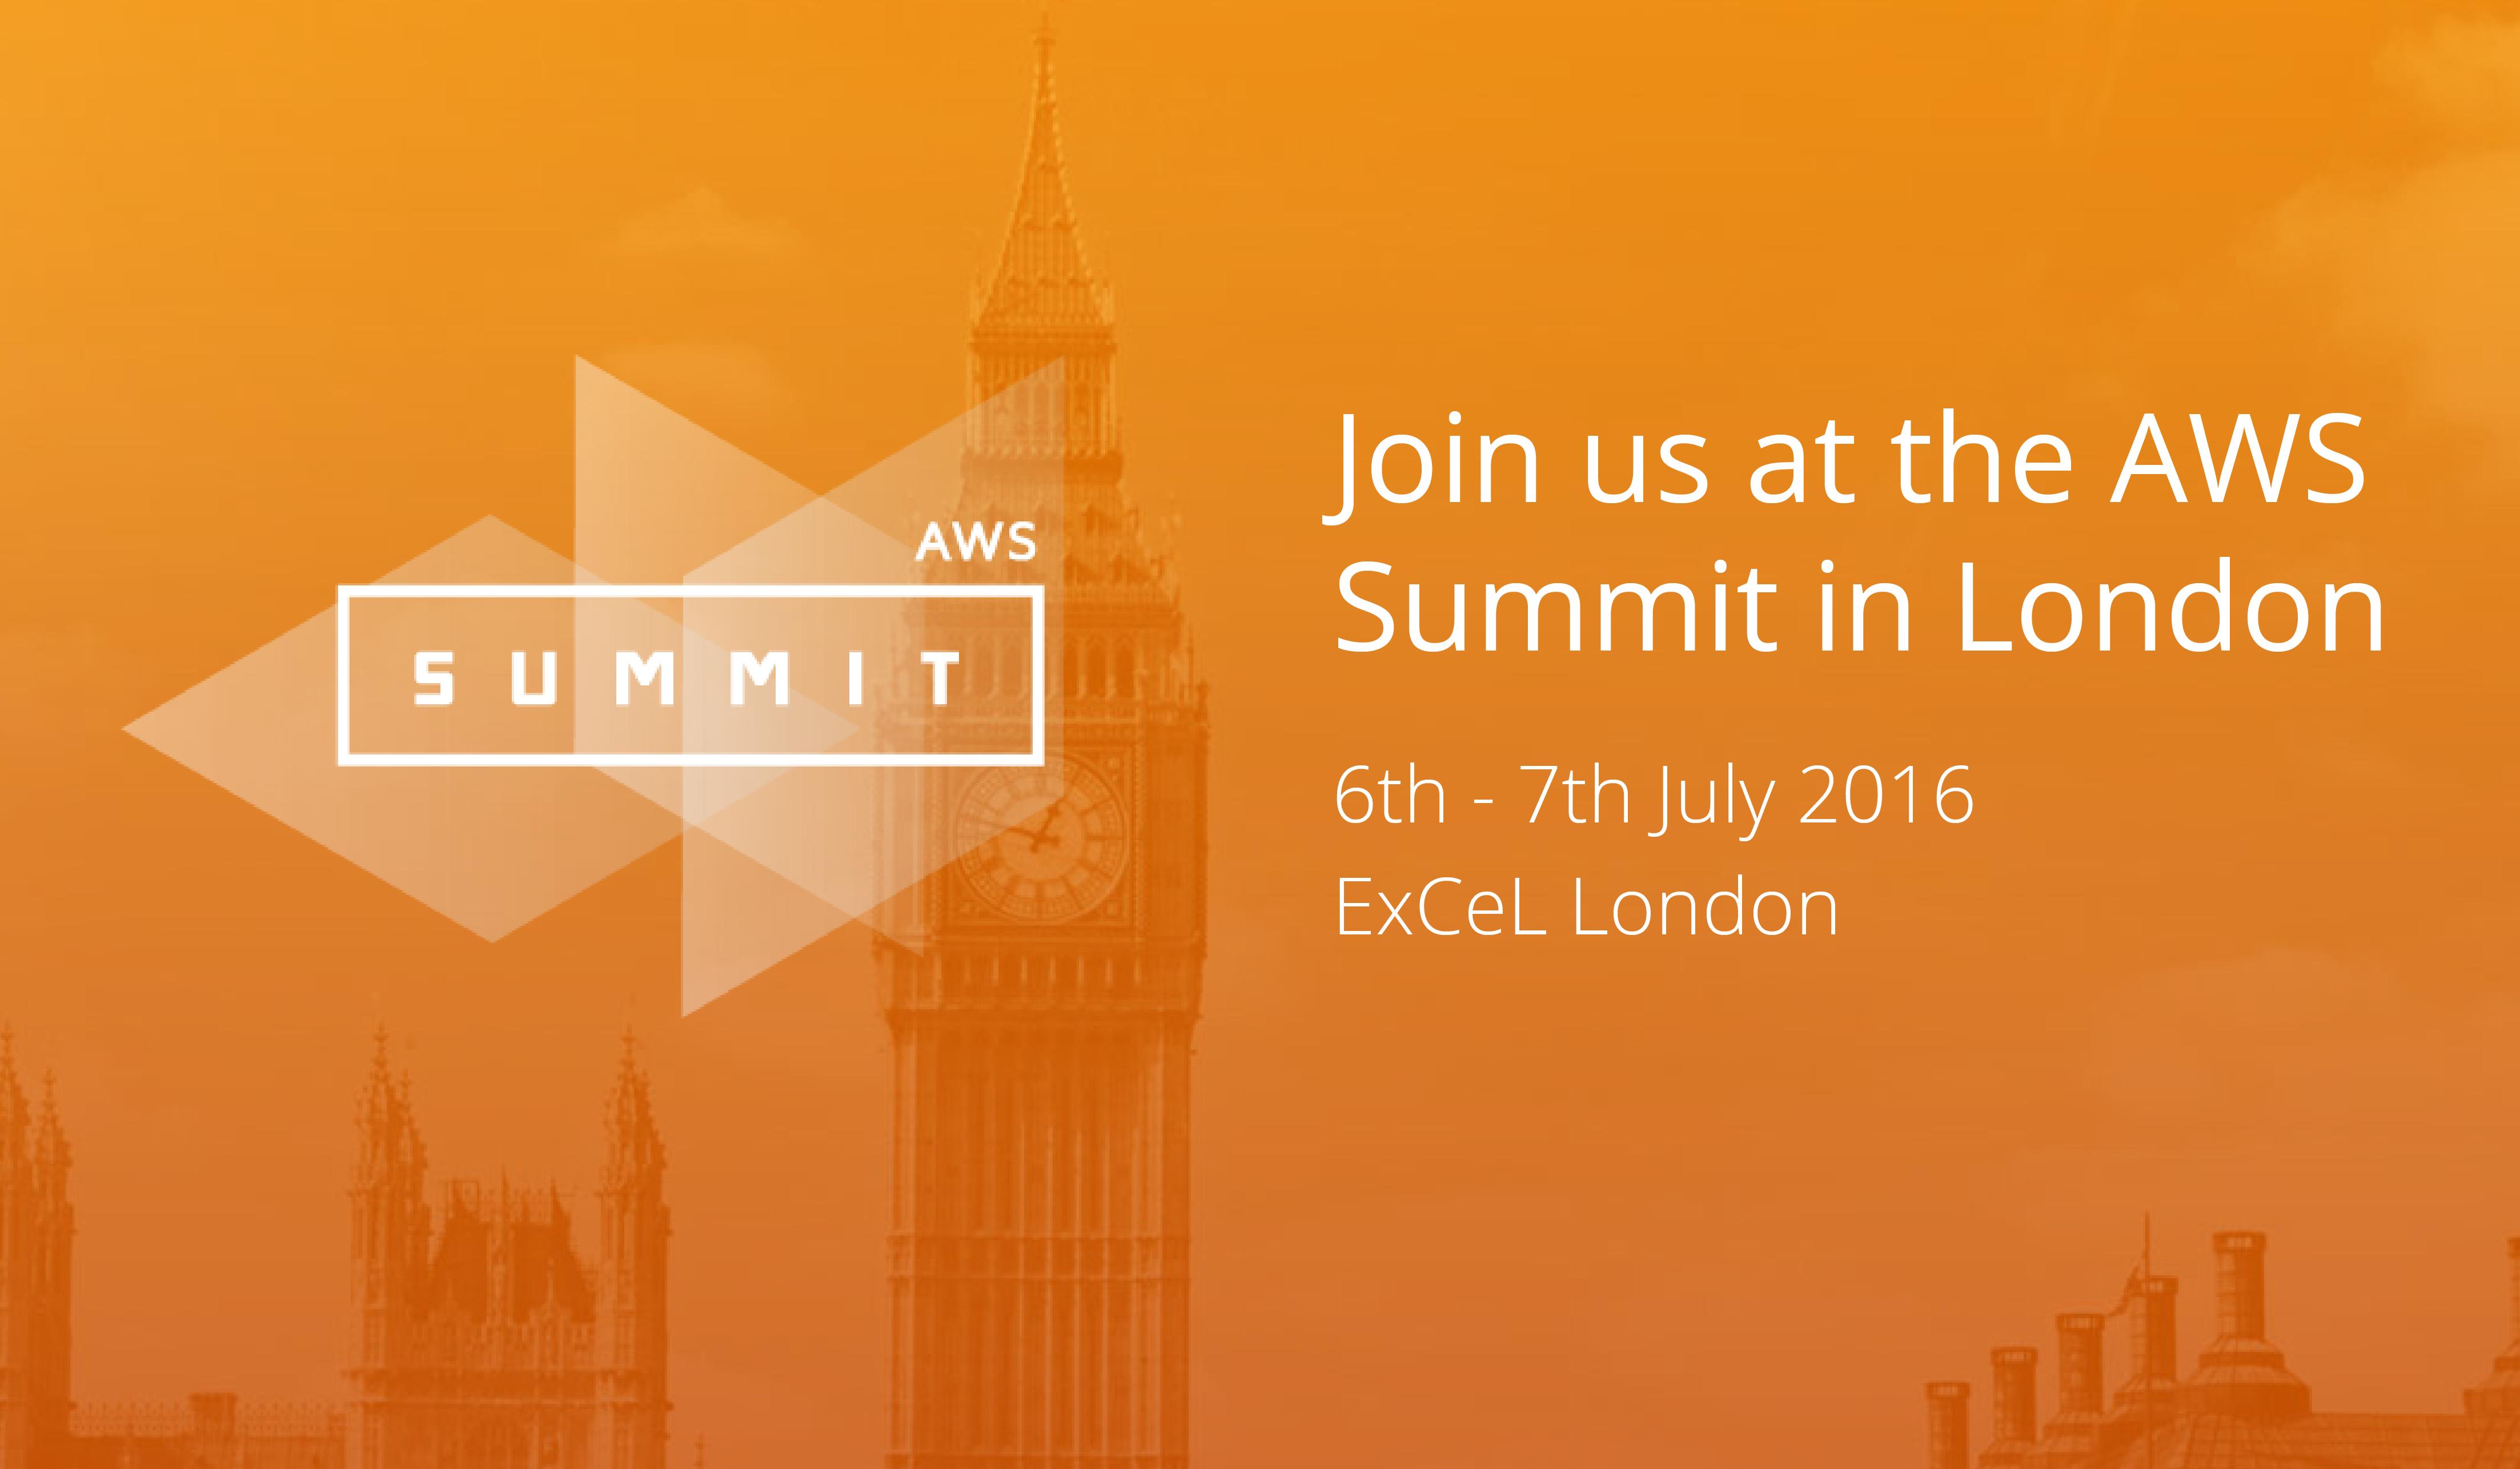 aws london summit